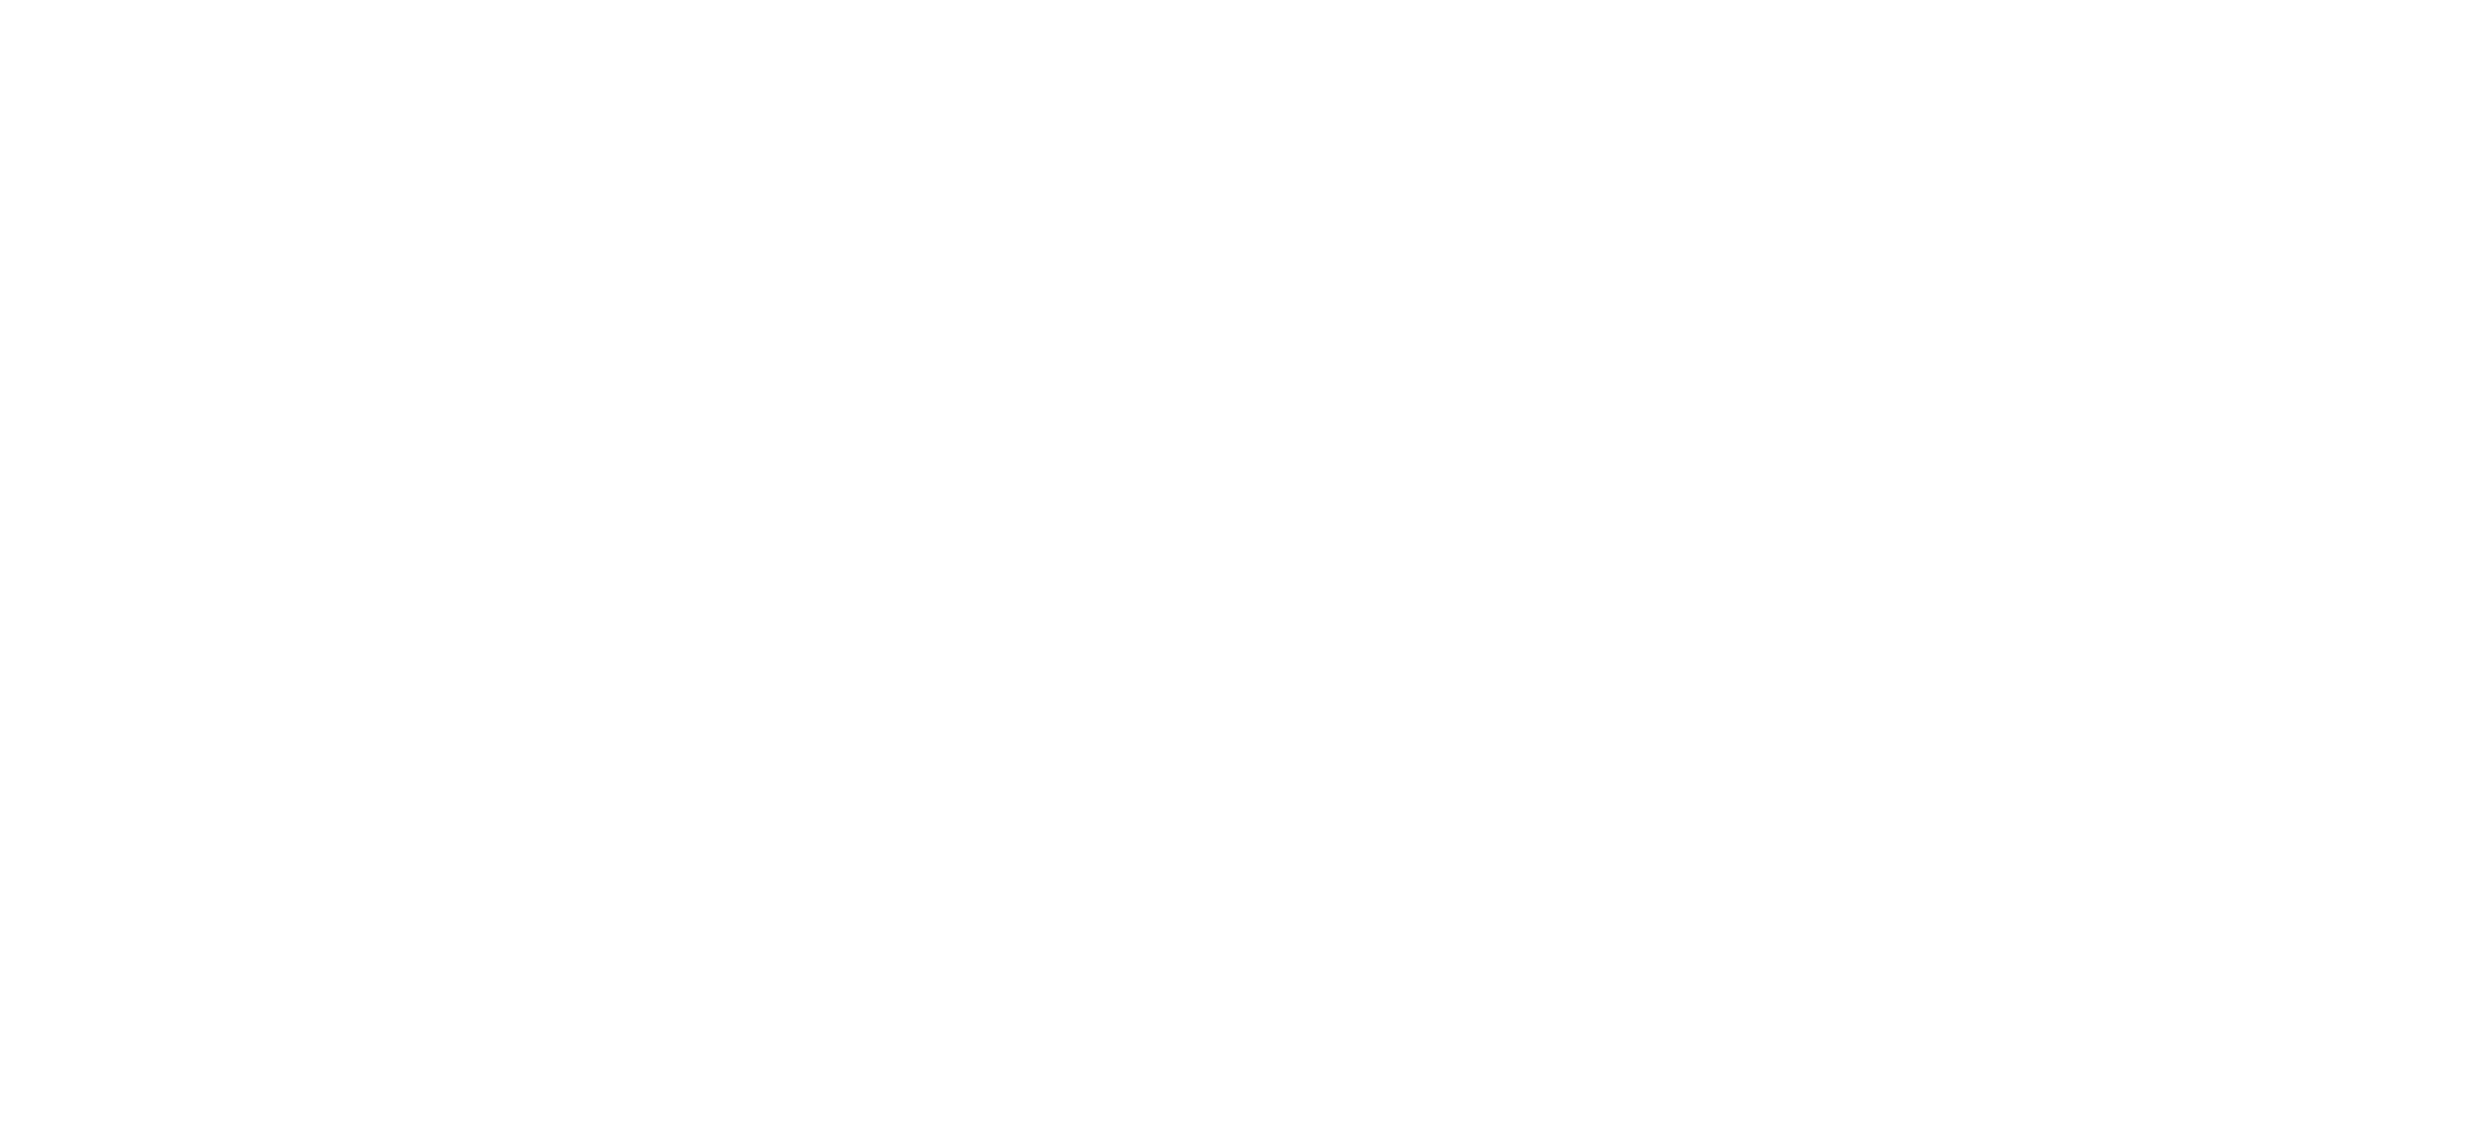 33030 - DDN Industry Perspectives Logo - JR - Final - Knockout